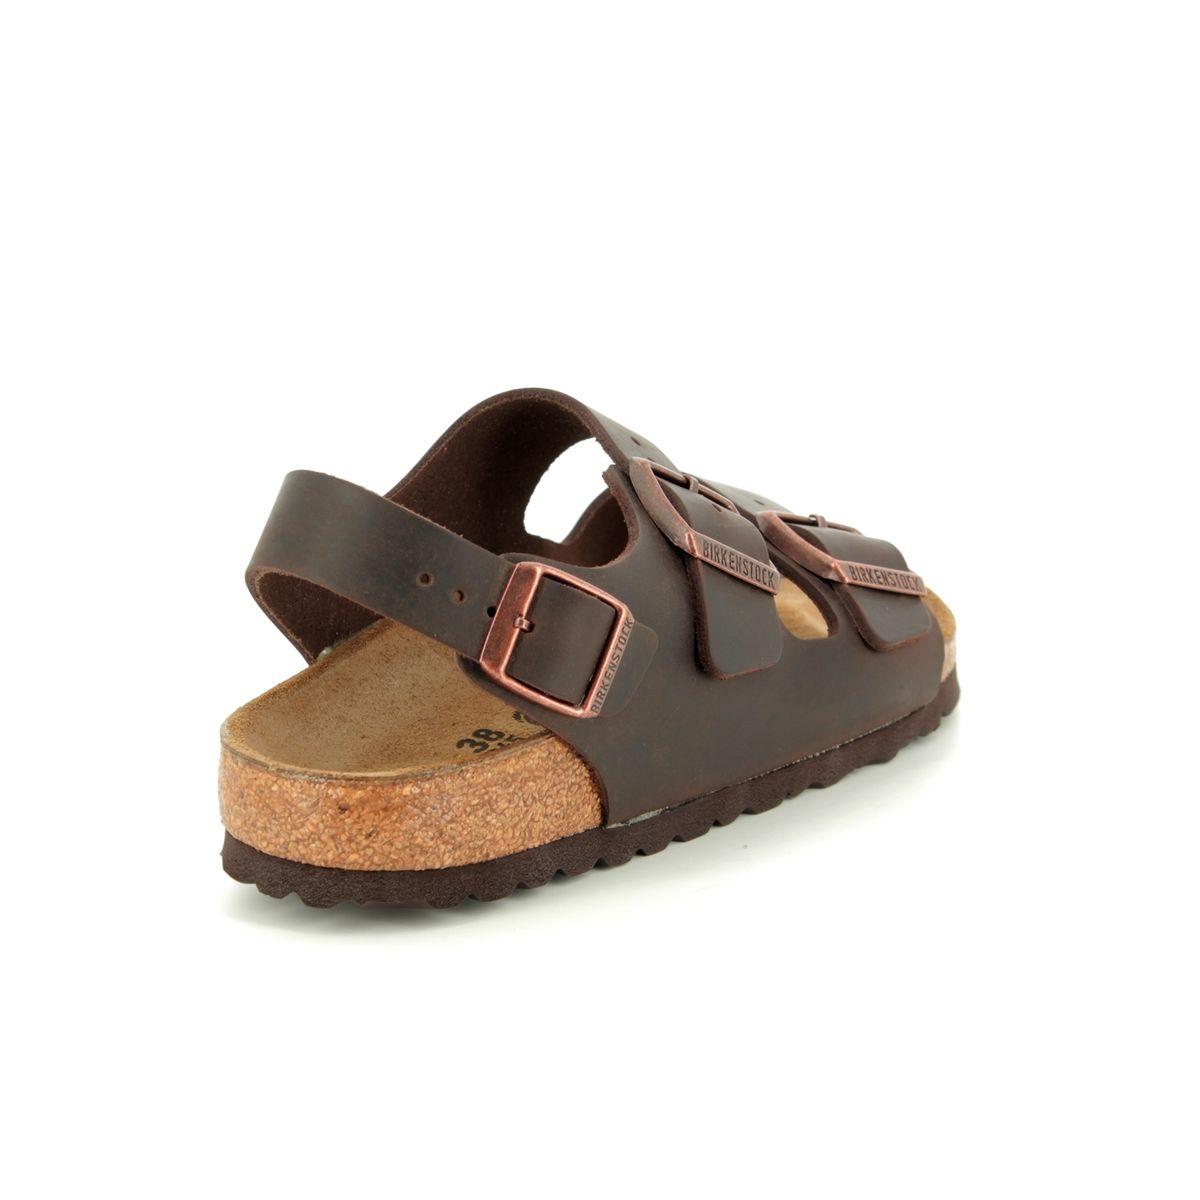 c946641b0c94 Birkenstock Sandals - Brown leather - 0034873 MILANO HABANA OILED LEATHER